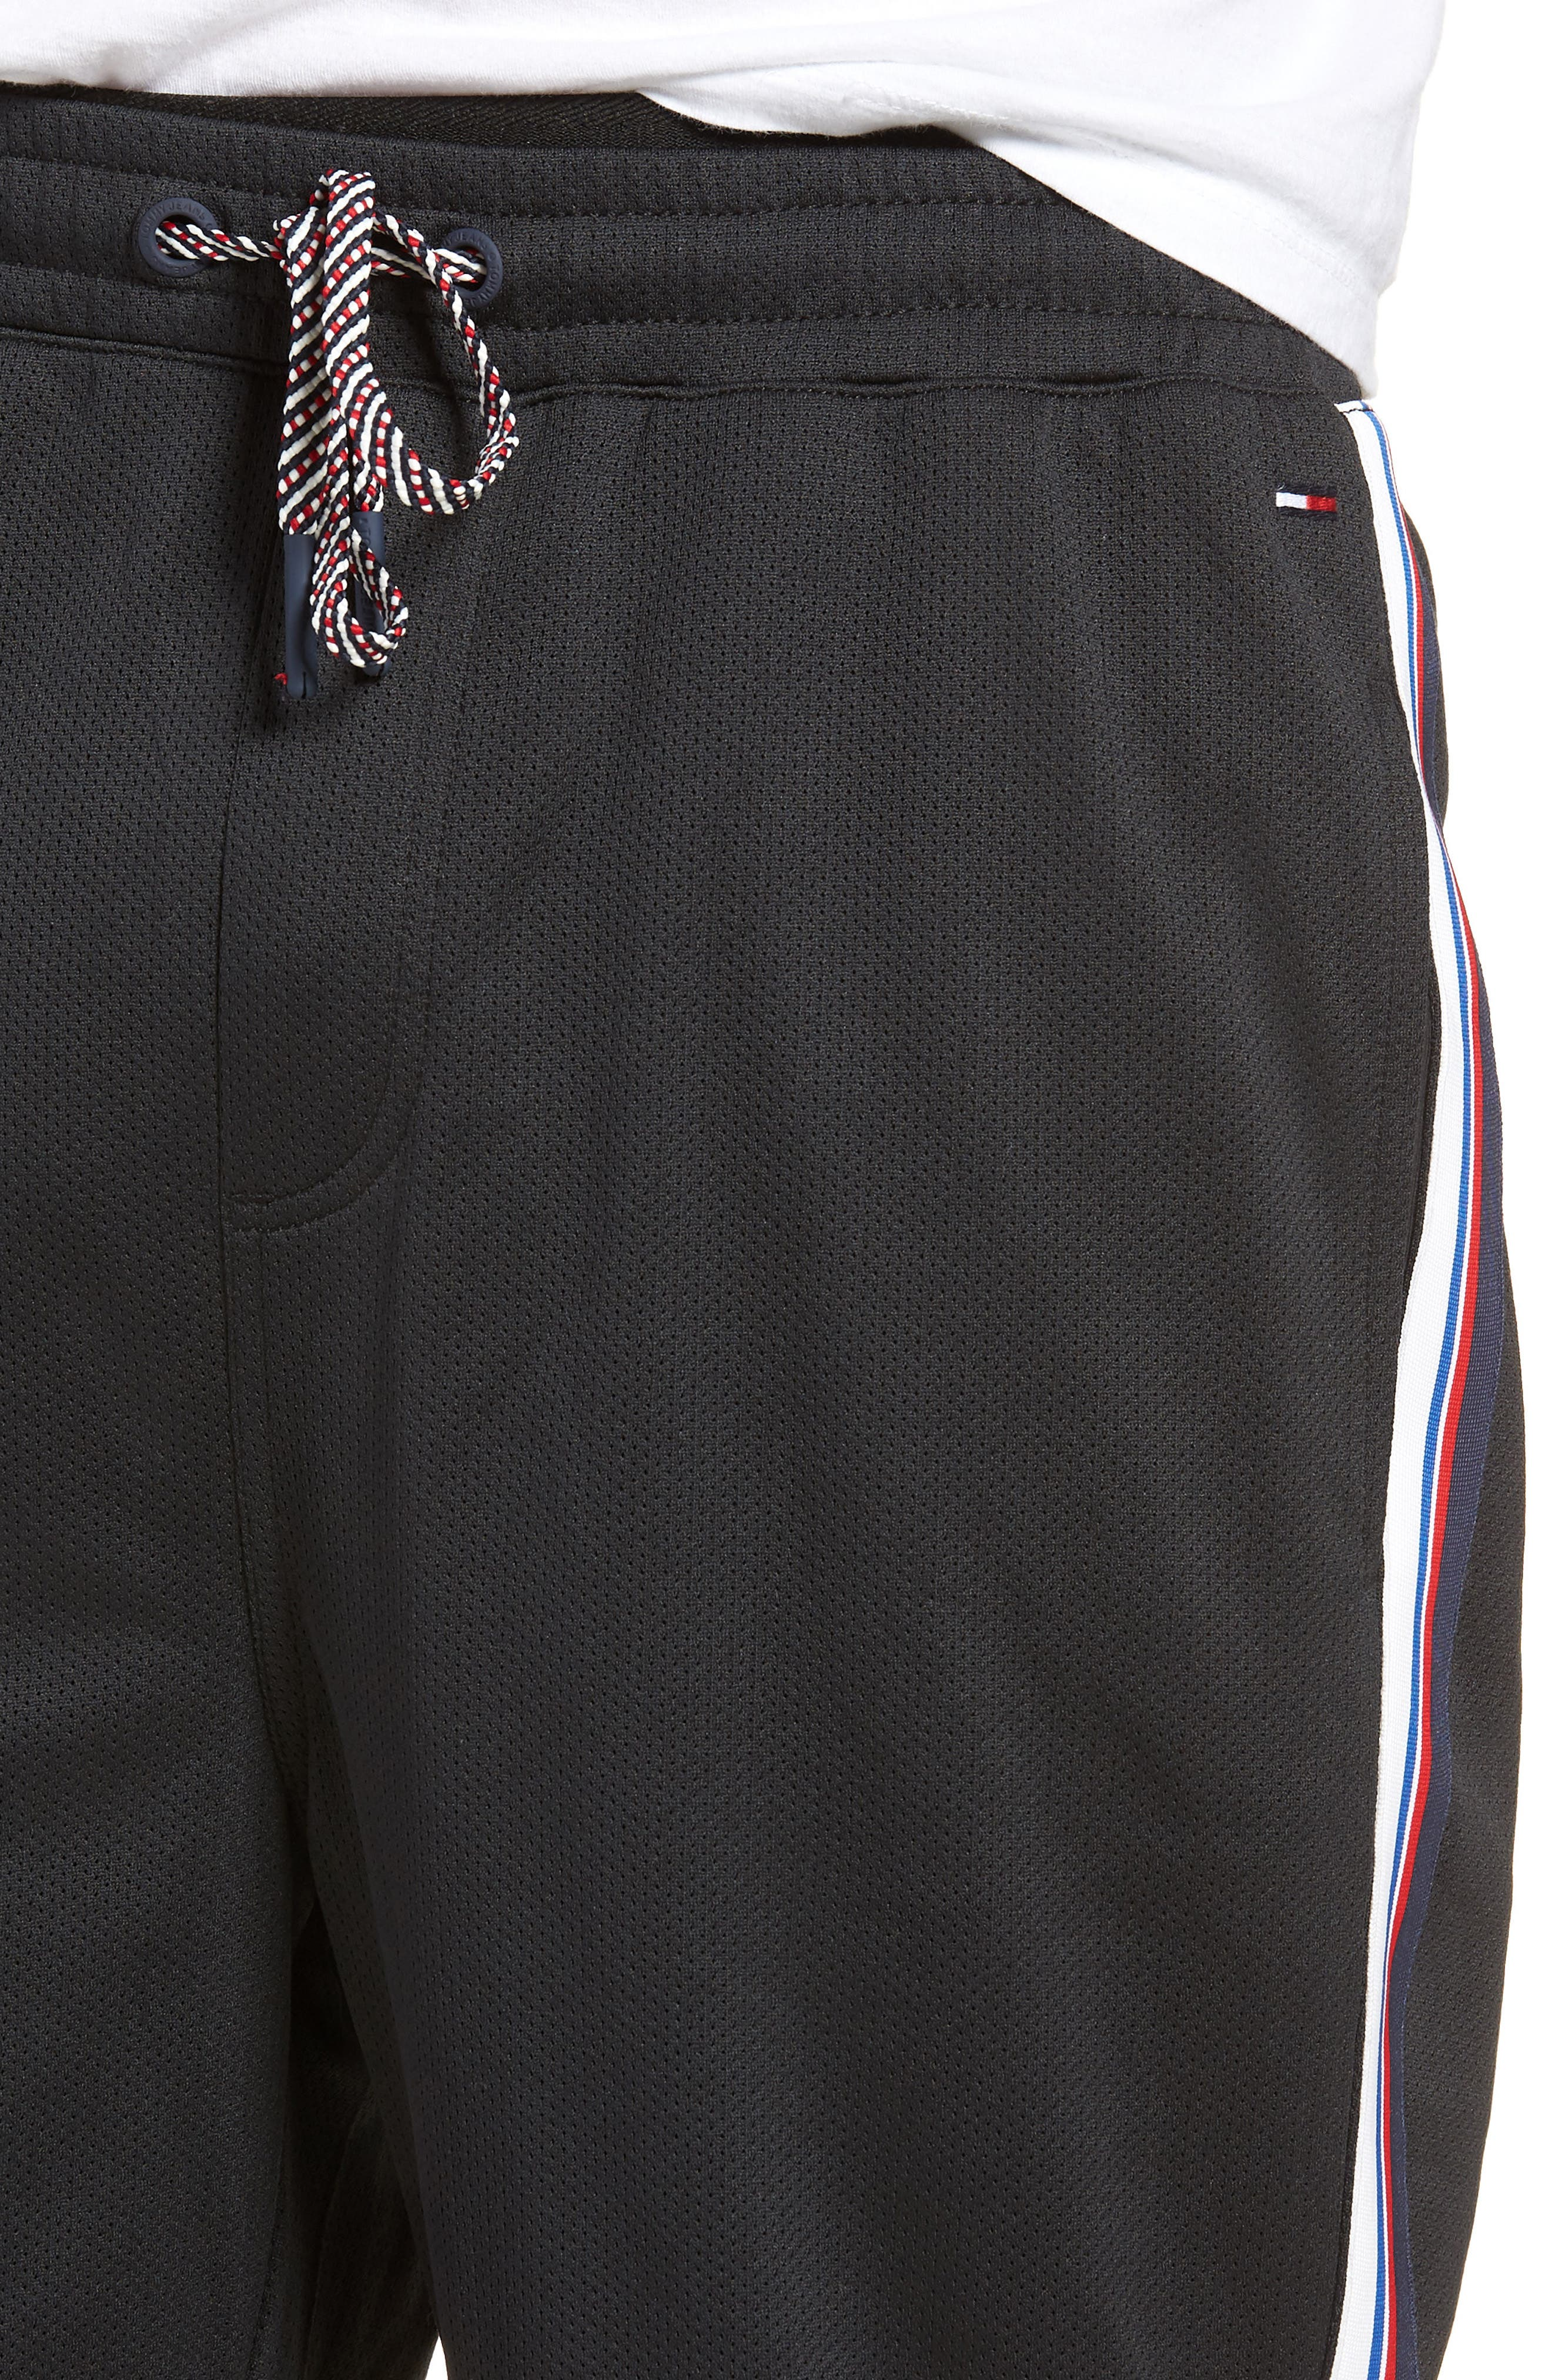 Lightweight Basketball Shorts,                             Alternate thumbnail 4, color,                             001